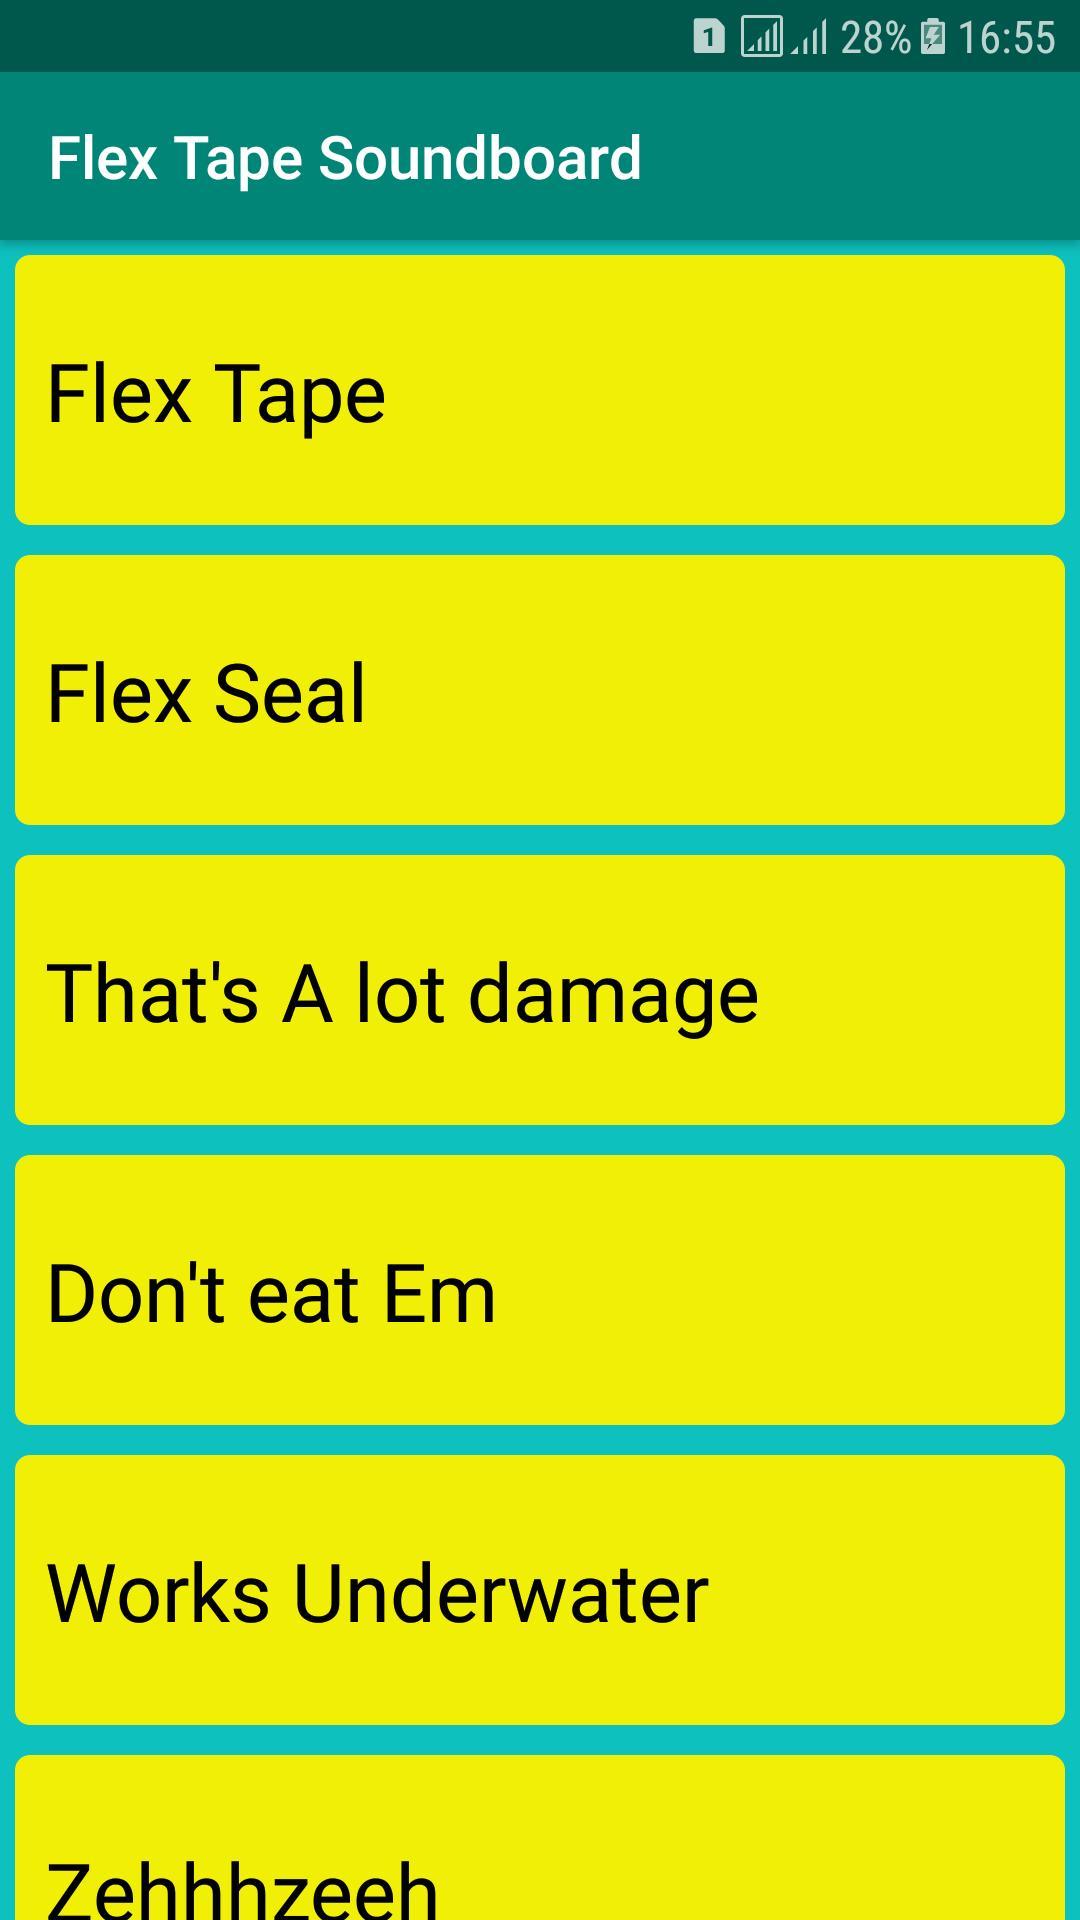 Flex Tape Soundboard for Android - APK Download